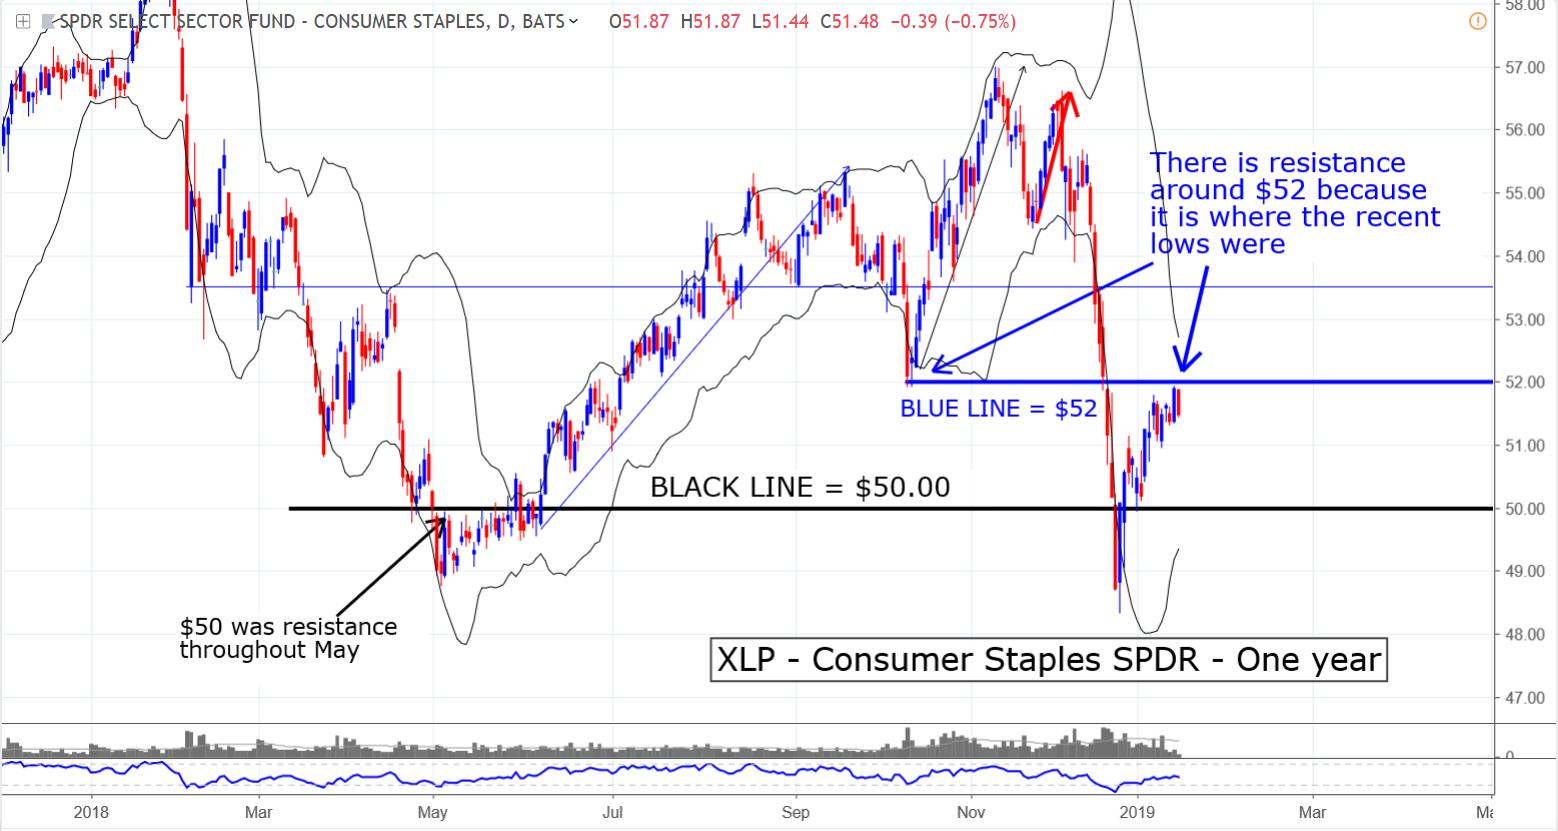 XLP staples spdr